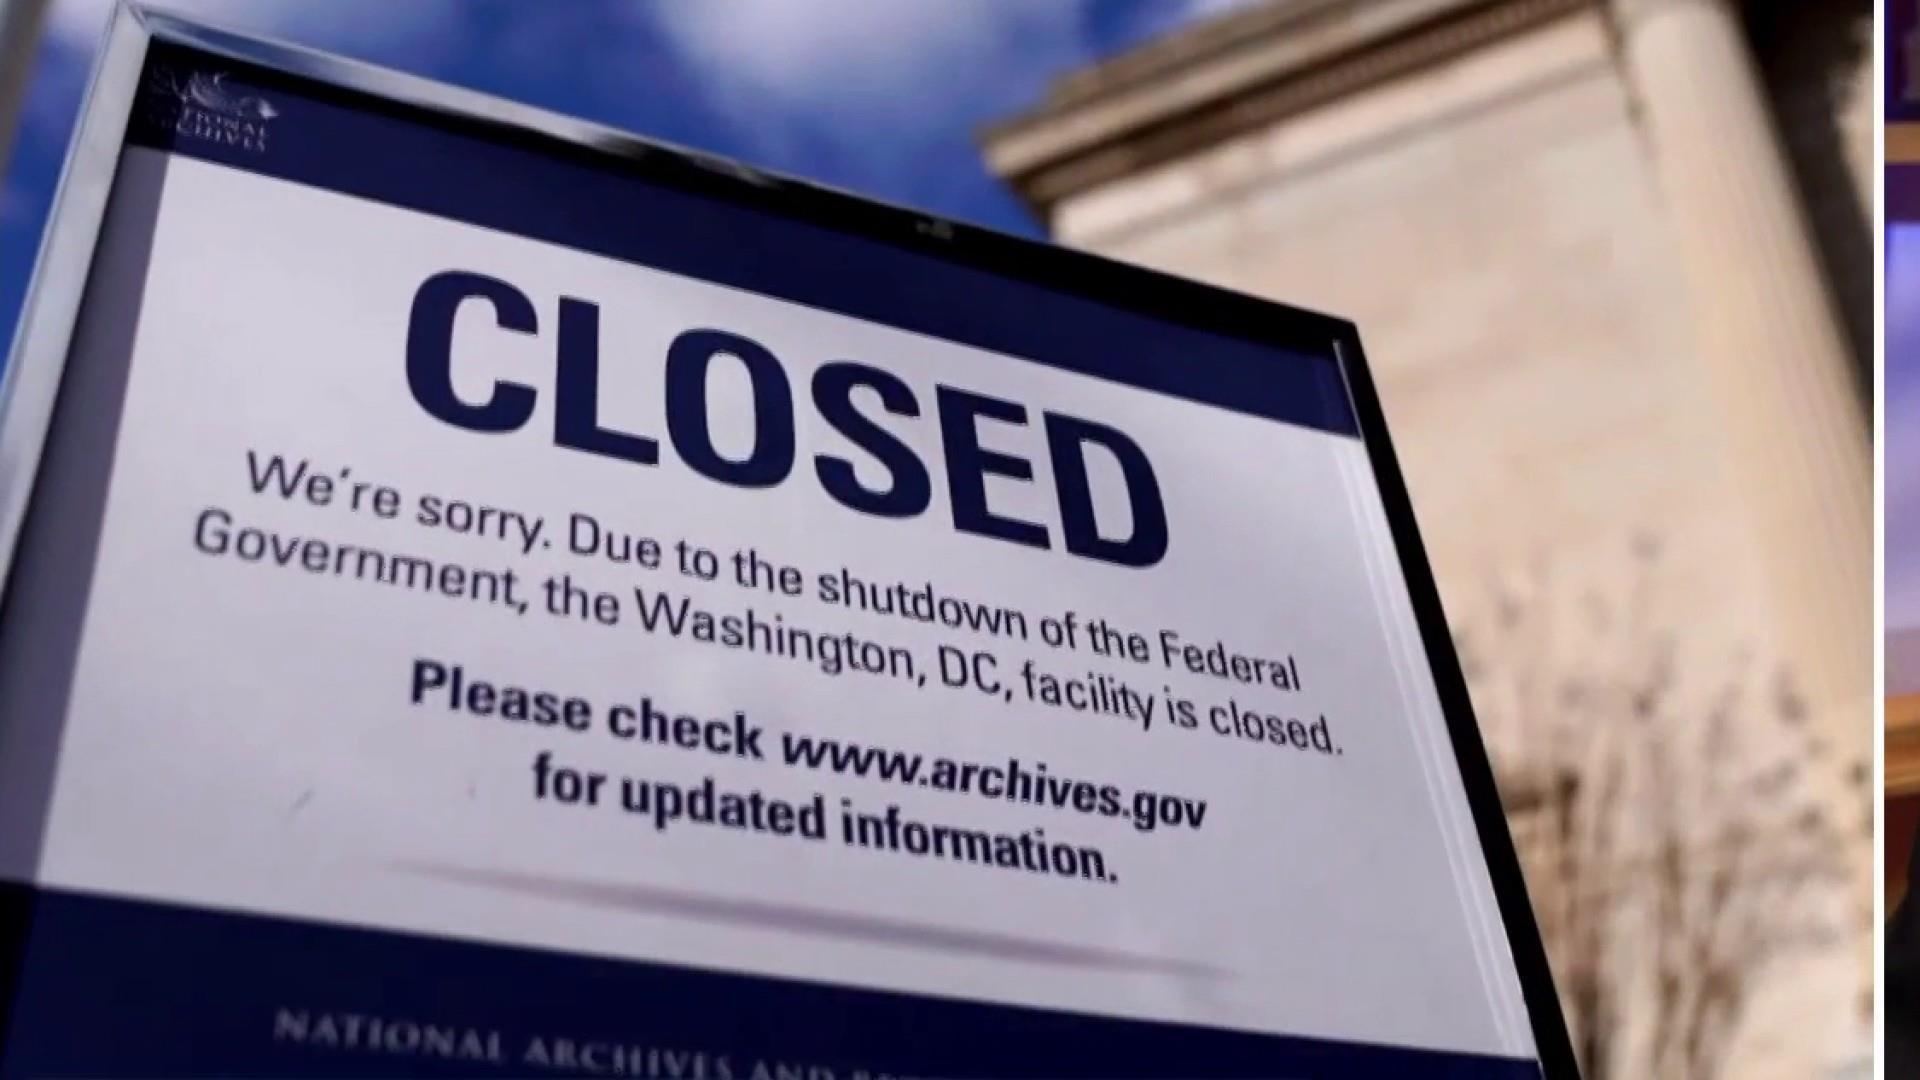 Combat vet: Veterans are 'terrified' by government shutdown